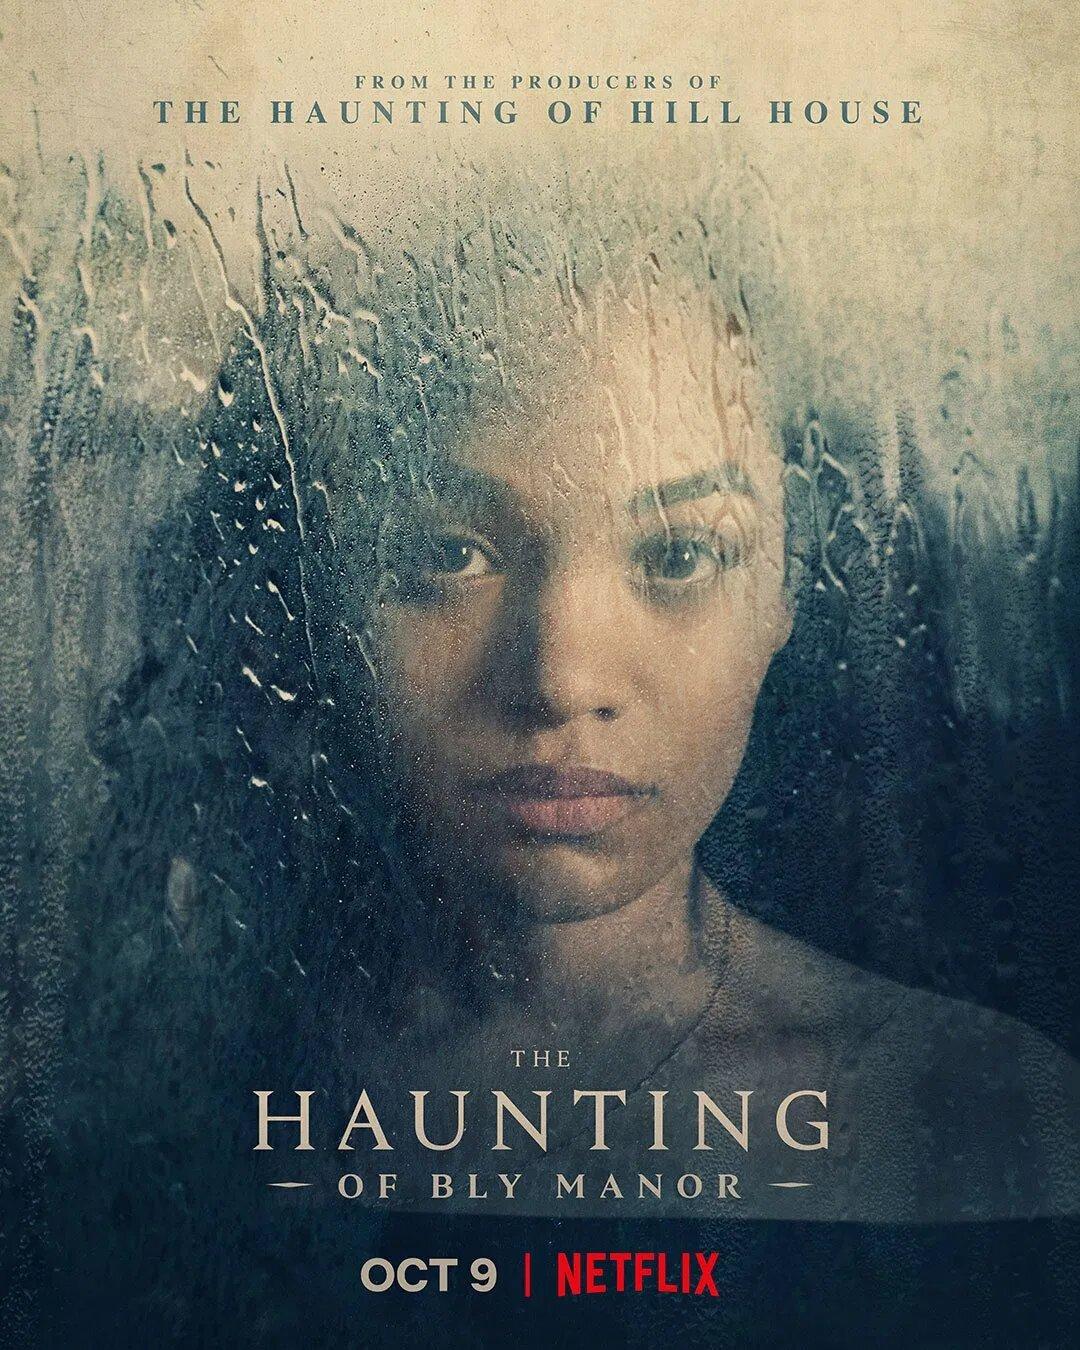 Hubie Halloween de Adam Sandler destronado como título nº 1 da Netflix 1